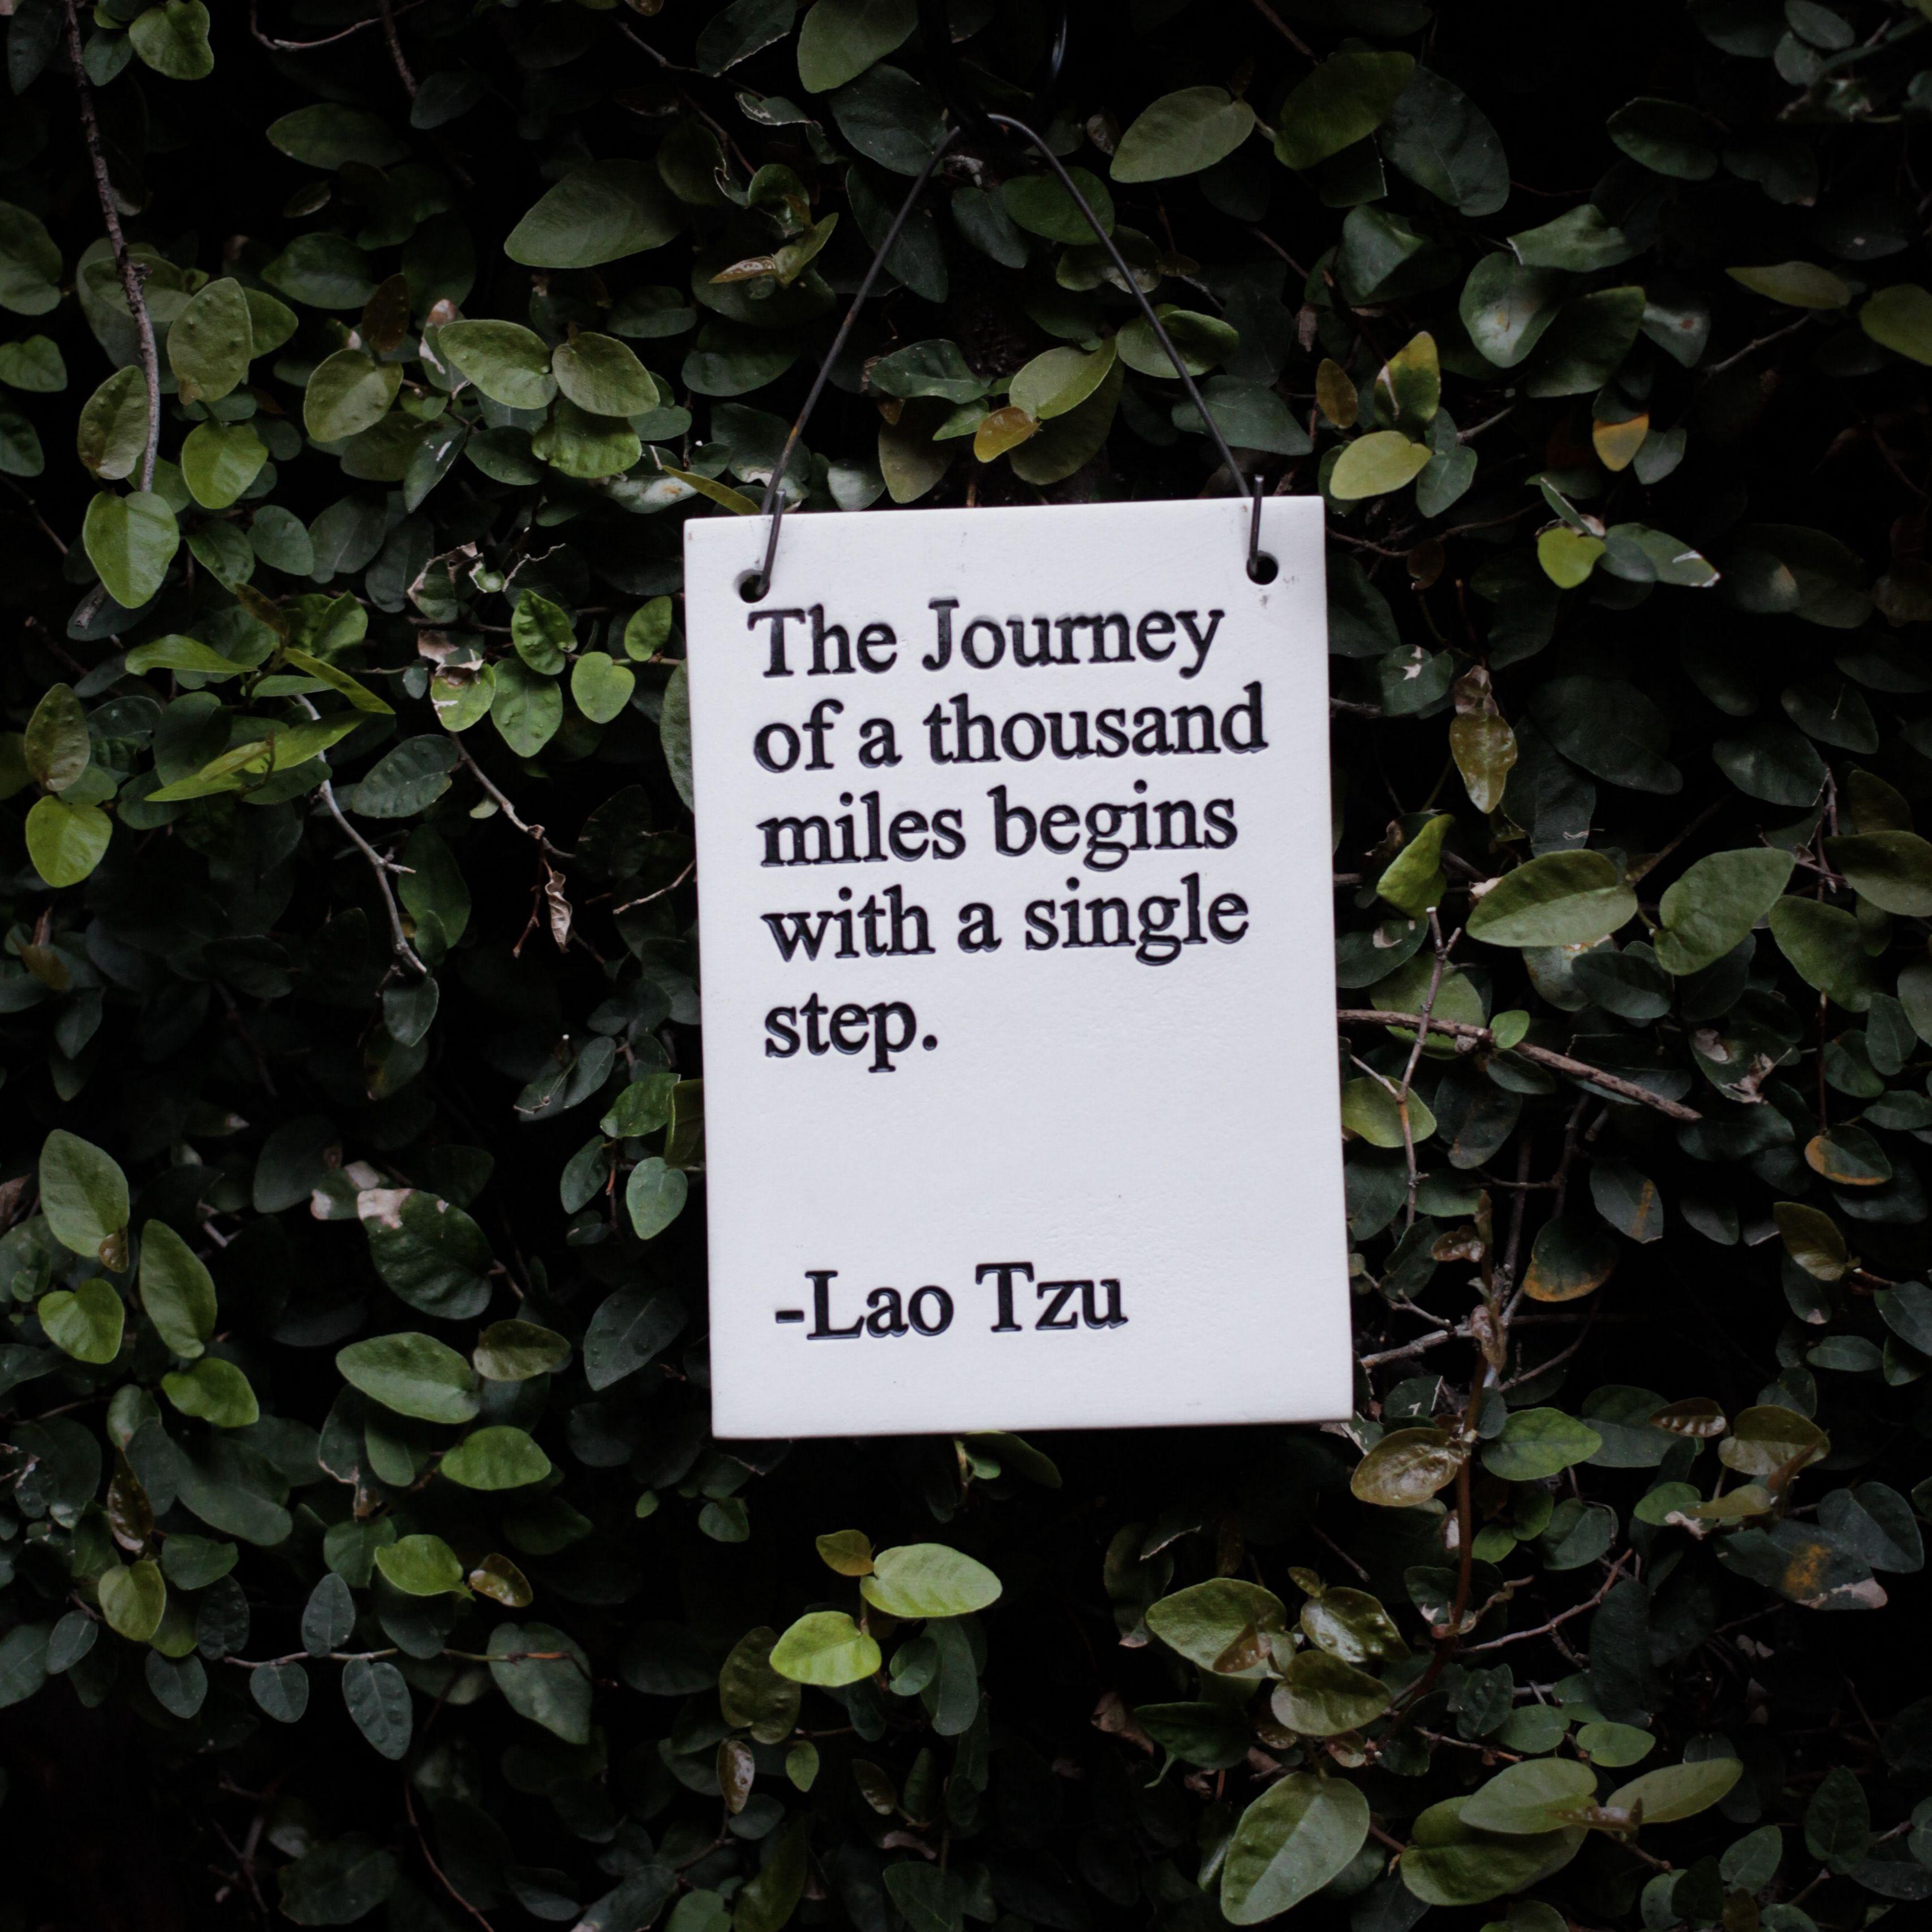 3415x3415 Wallpaper quote, phrase, words, inscription, signboard, bush, leaves